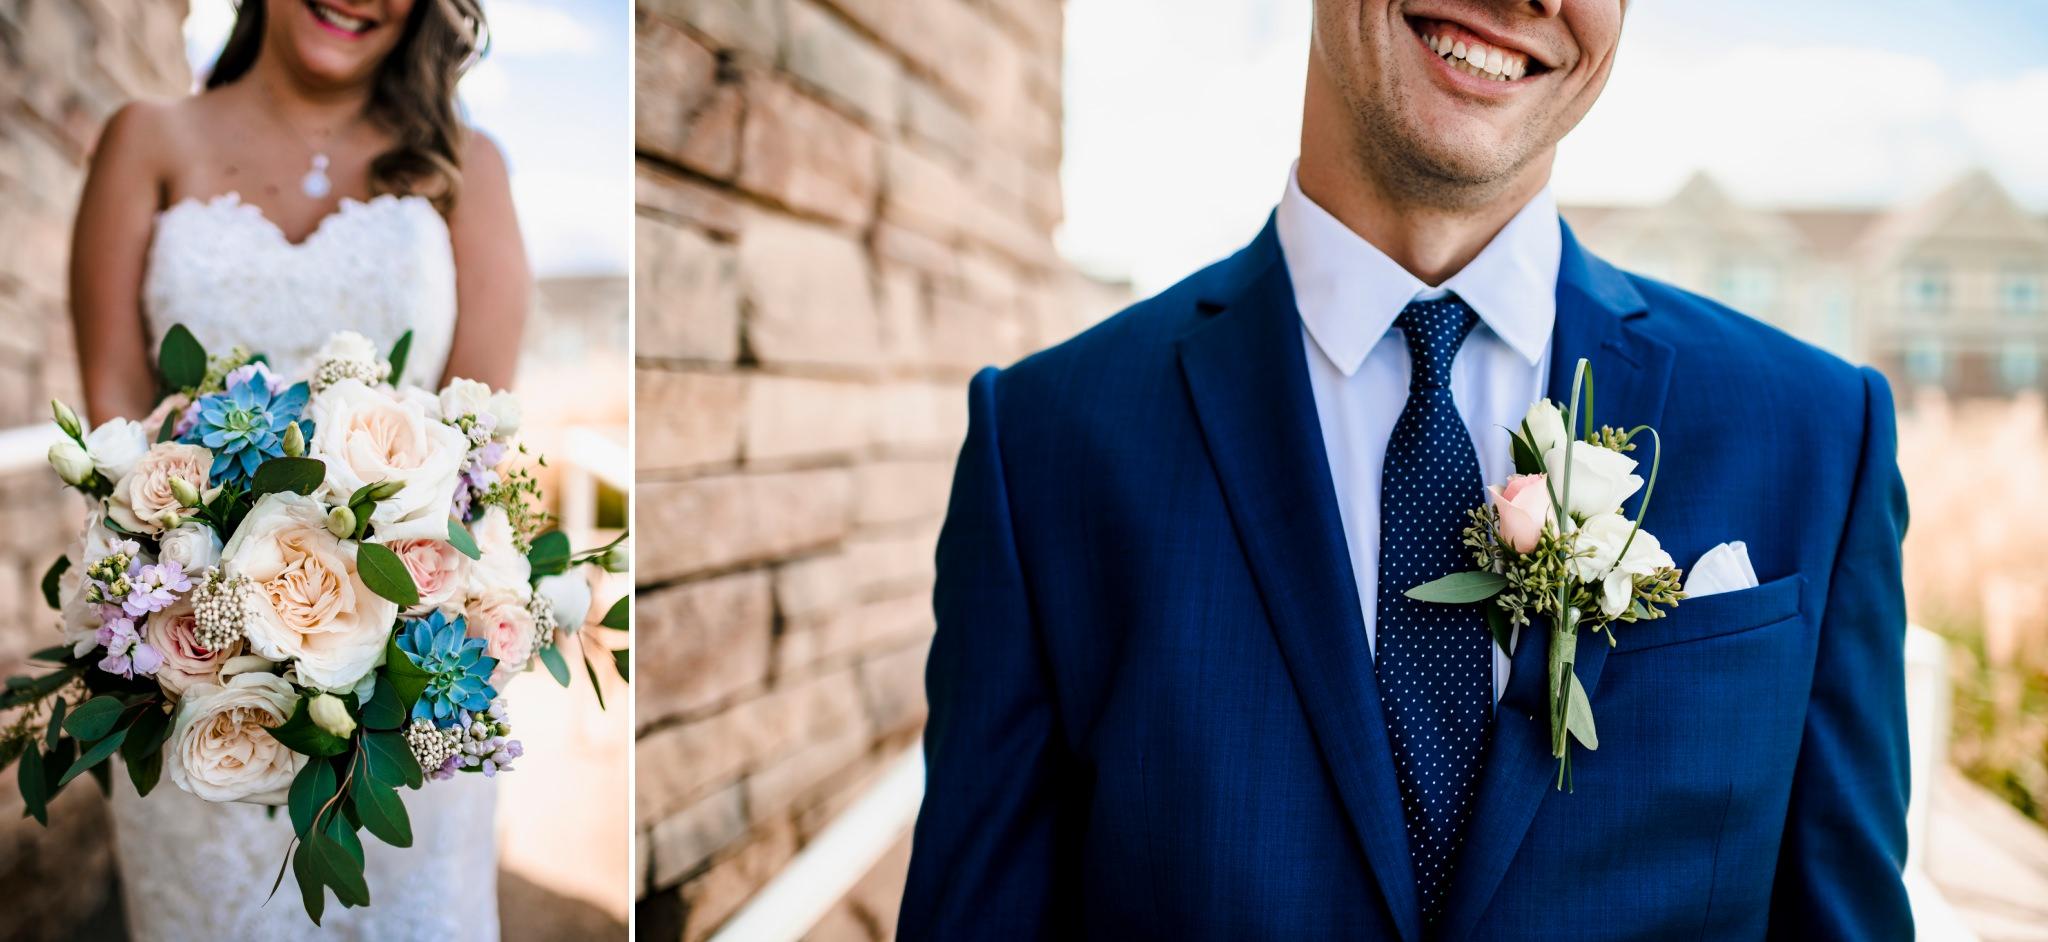 Culos-Sheraton-Eatontown-Long-Branch-Wedding-Photographer-44.JPG